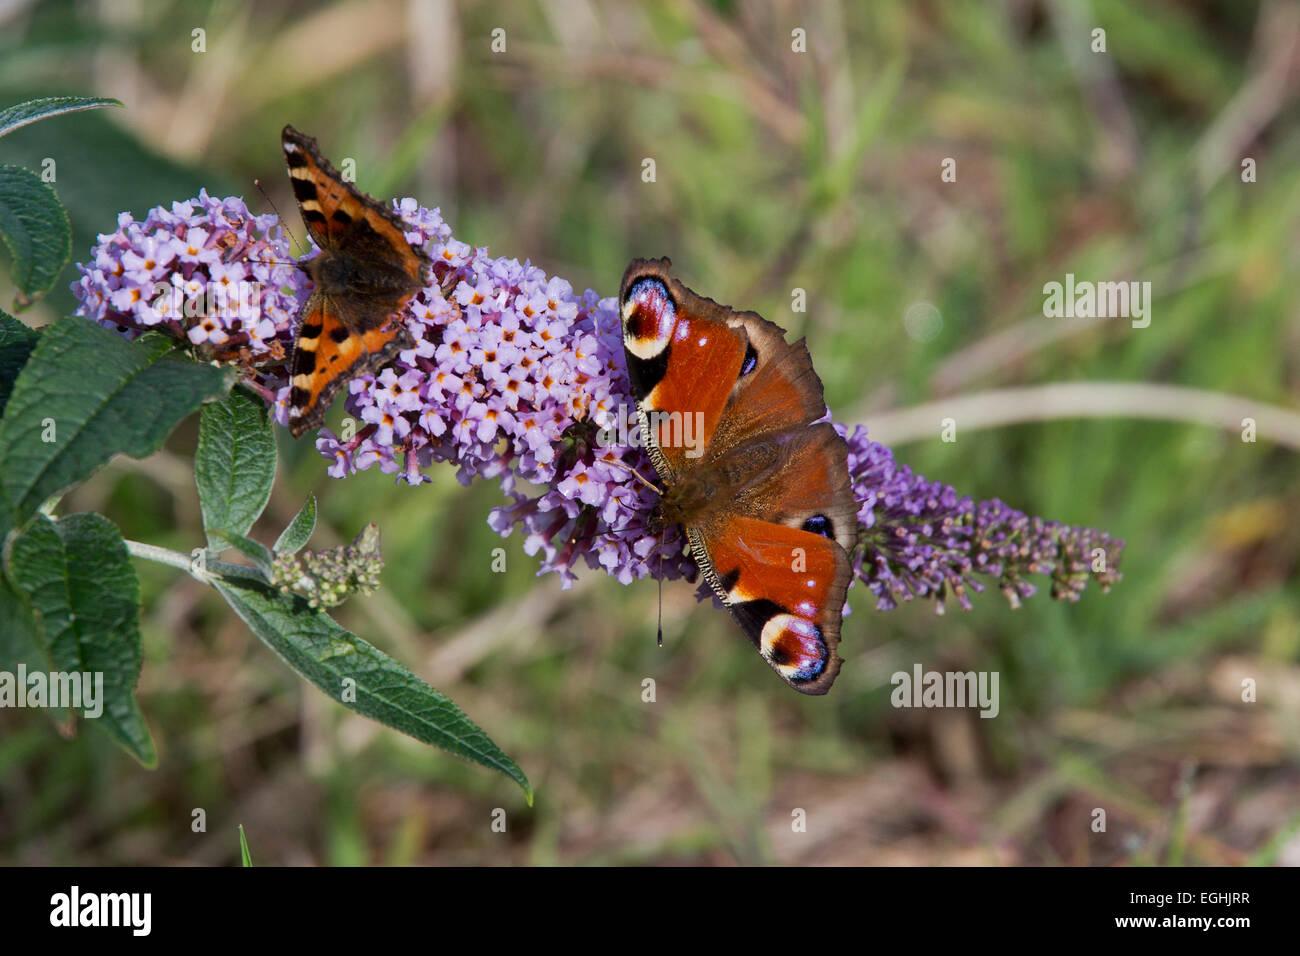 Peacock and Small Tortoiseshell butterflies nectaring on Buddleia flowers, Cornwall, England, UK. - Stock Image